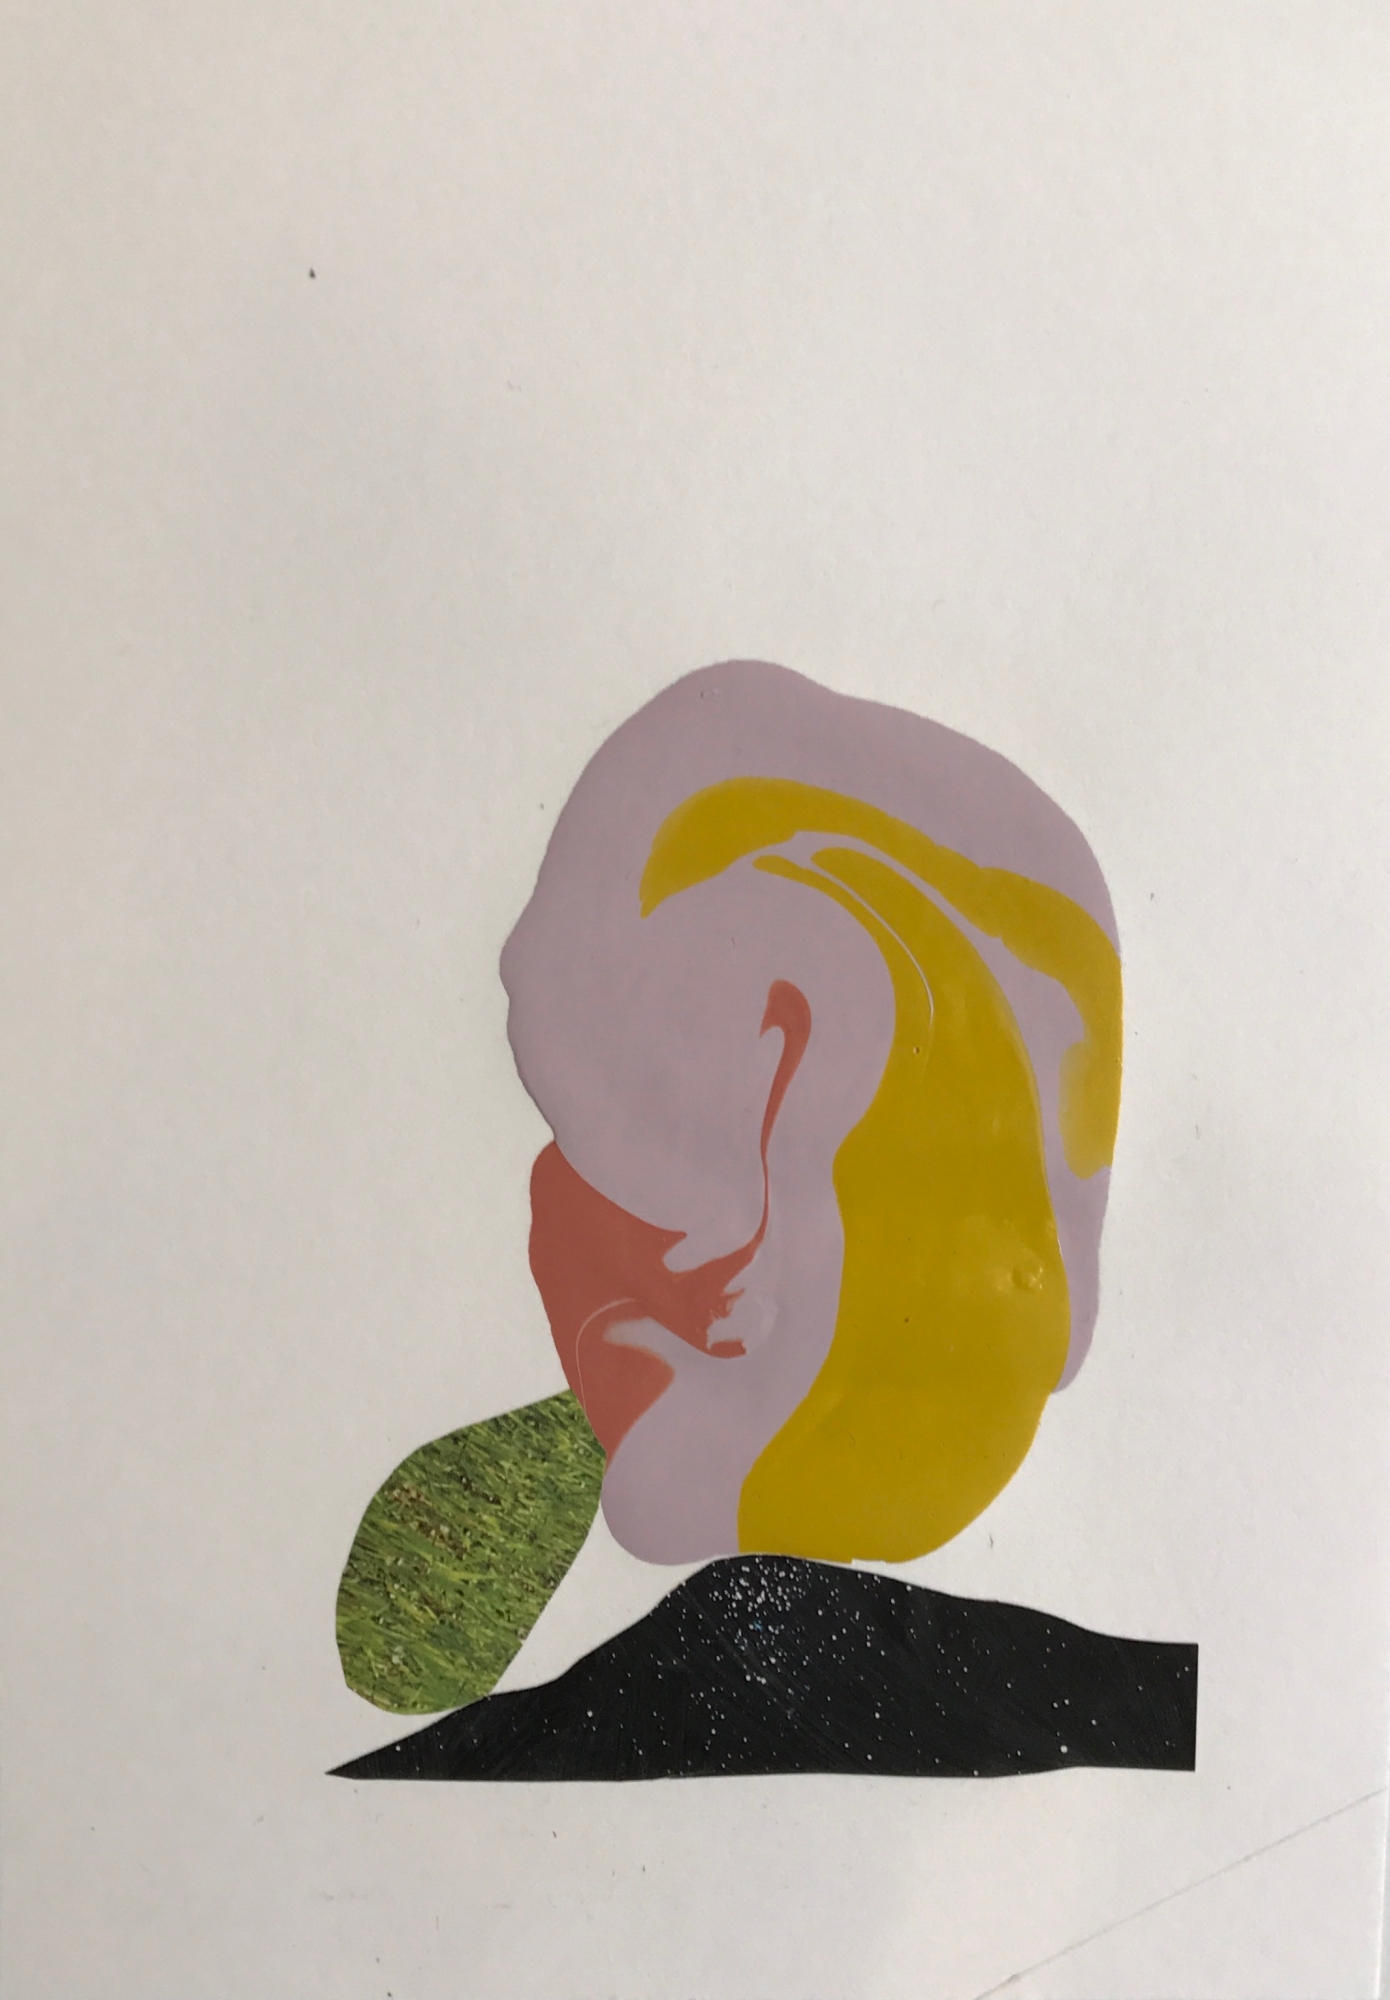 Blobject 23/50 by Stephanie Cormier